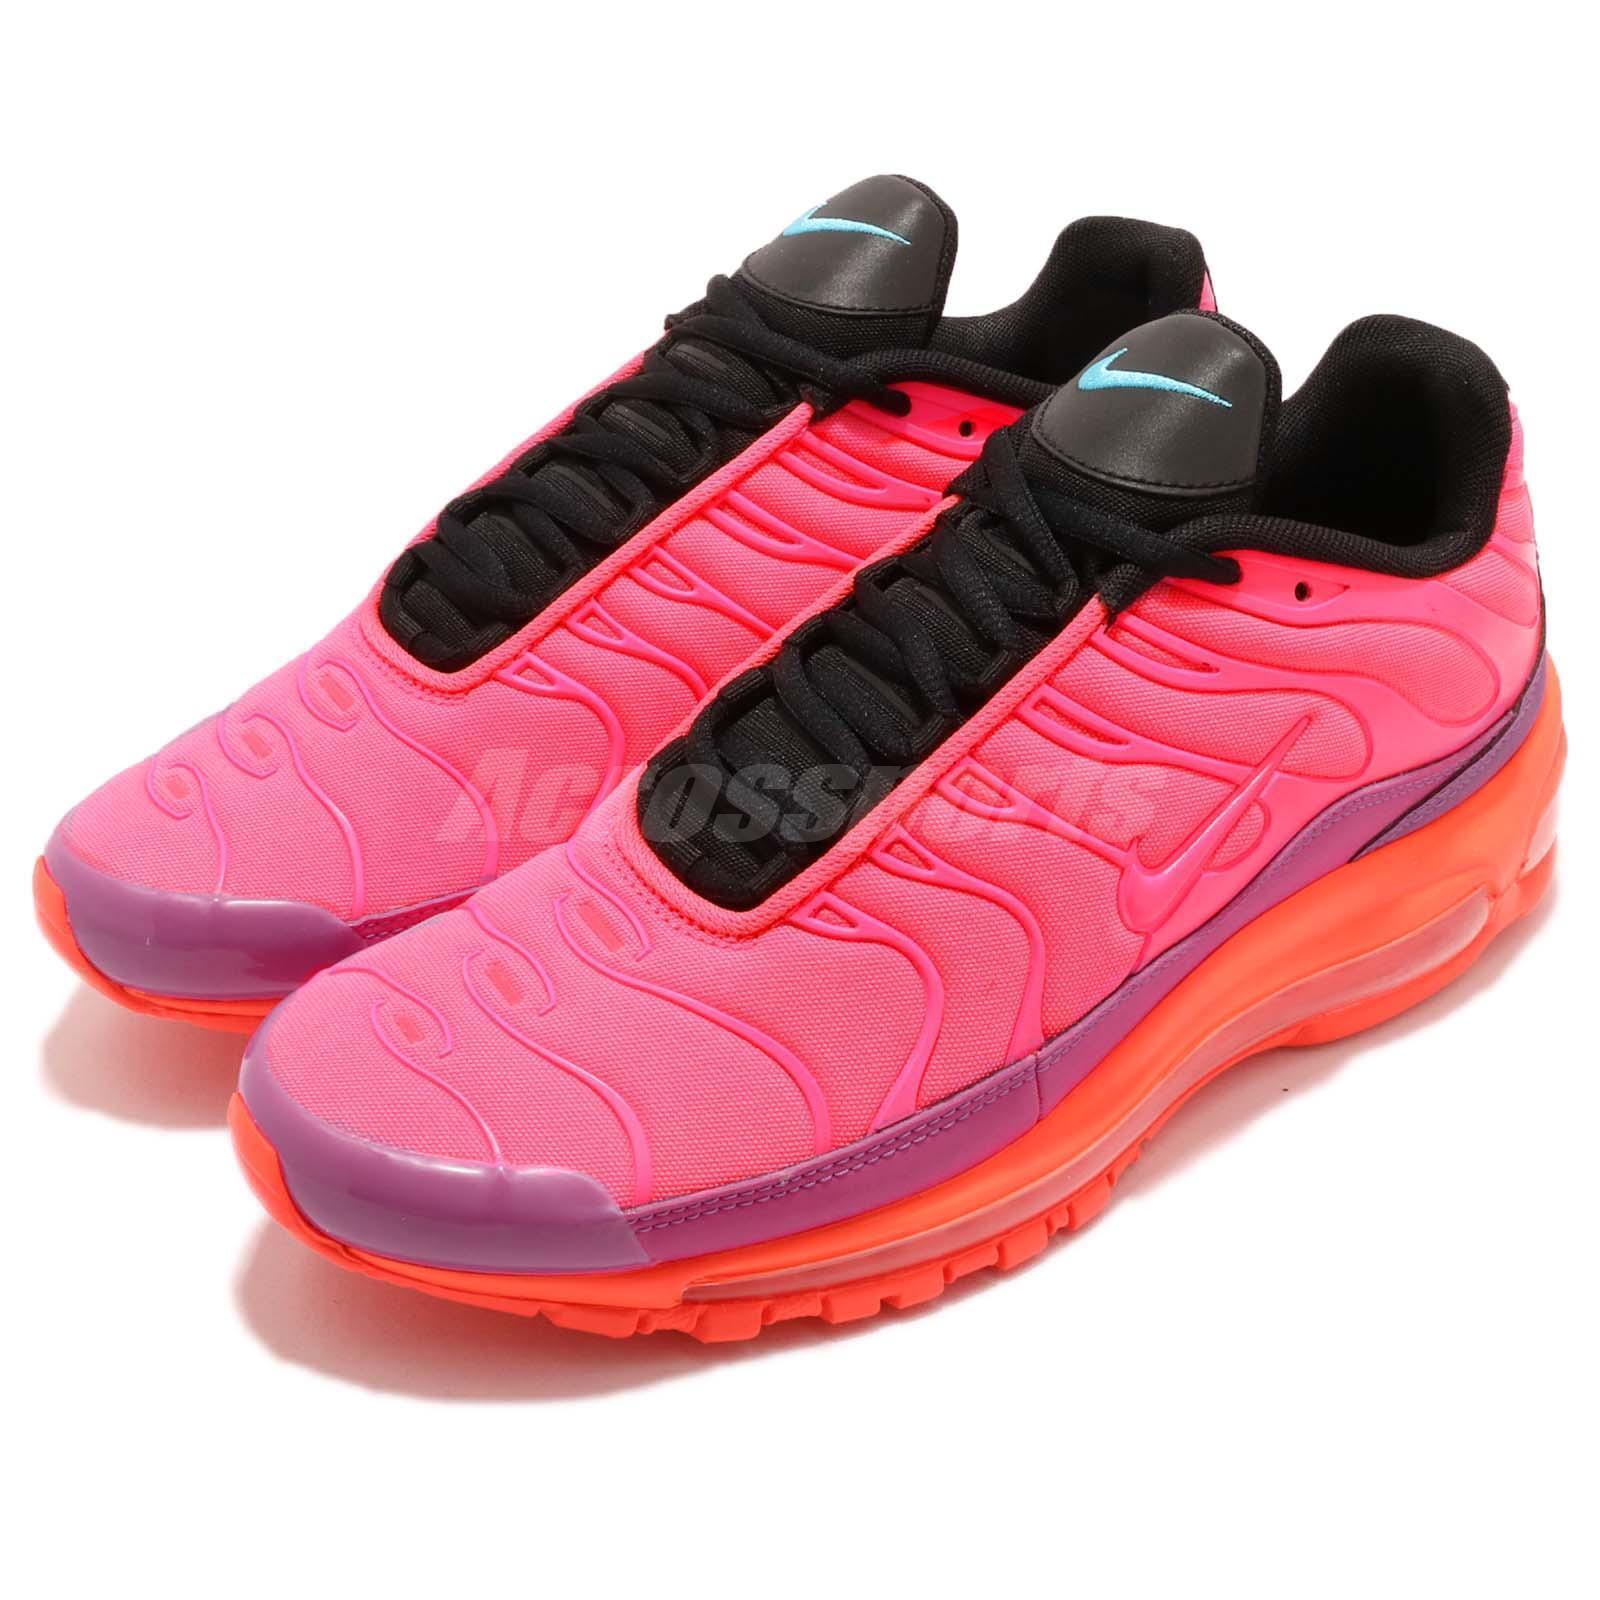 Nike air max 97 plus racer rosa hyper - magenta  laufschuhe ah8144-600